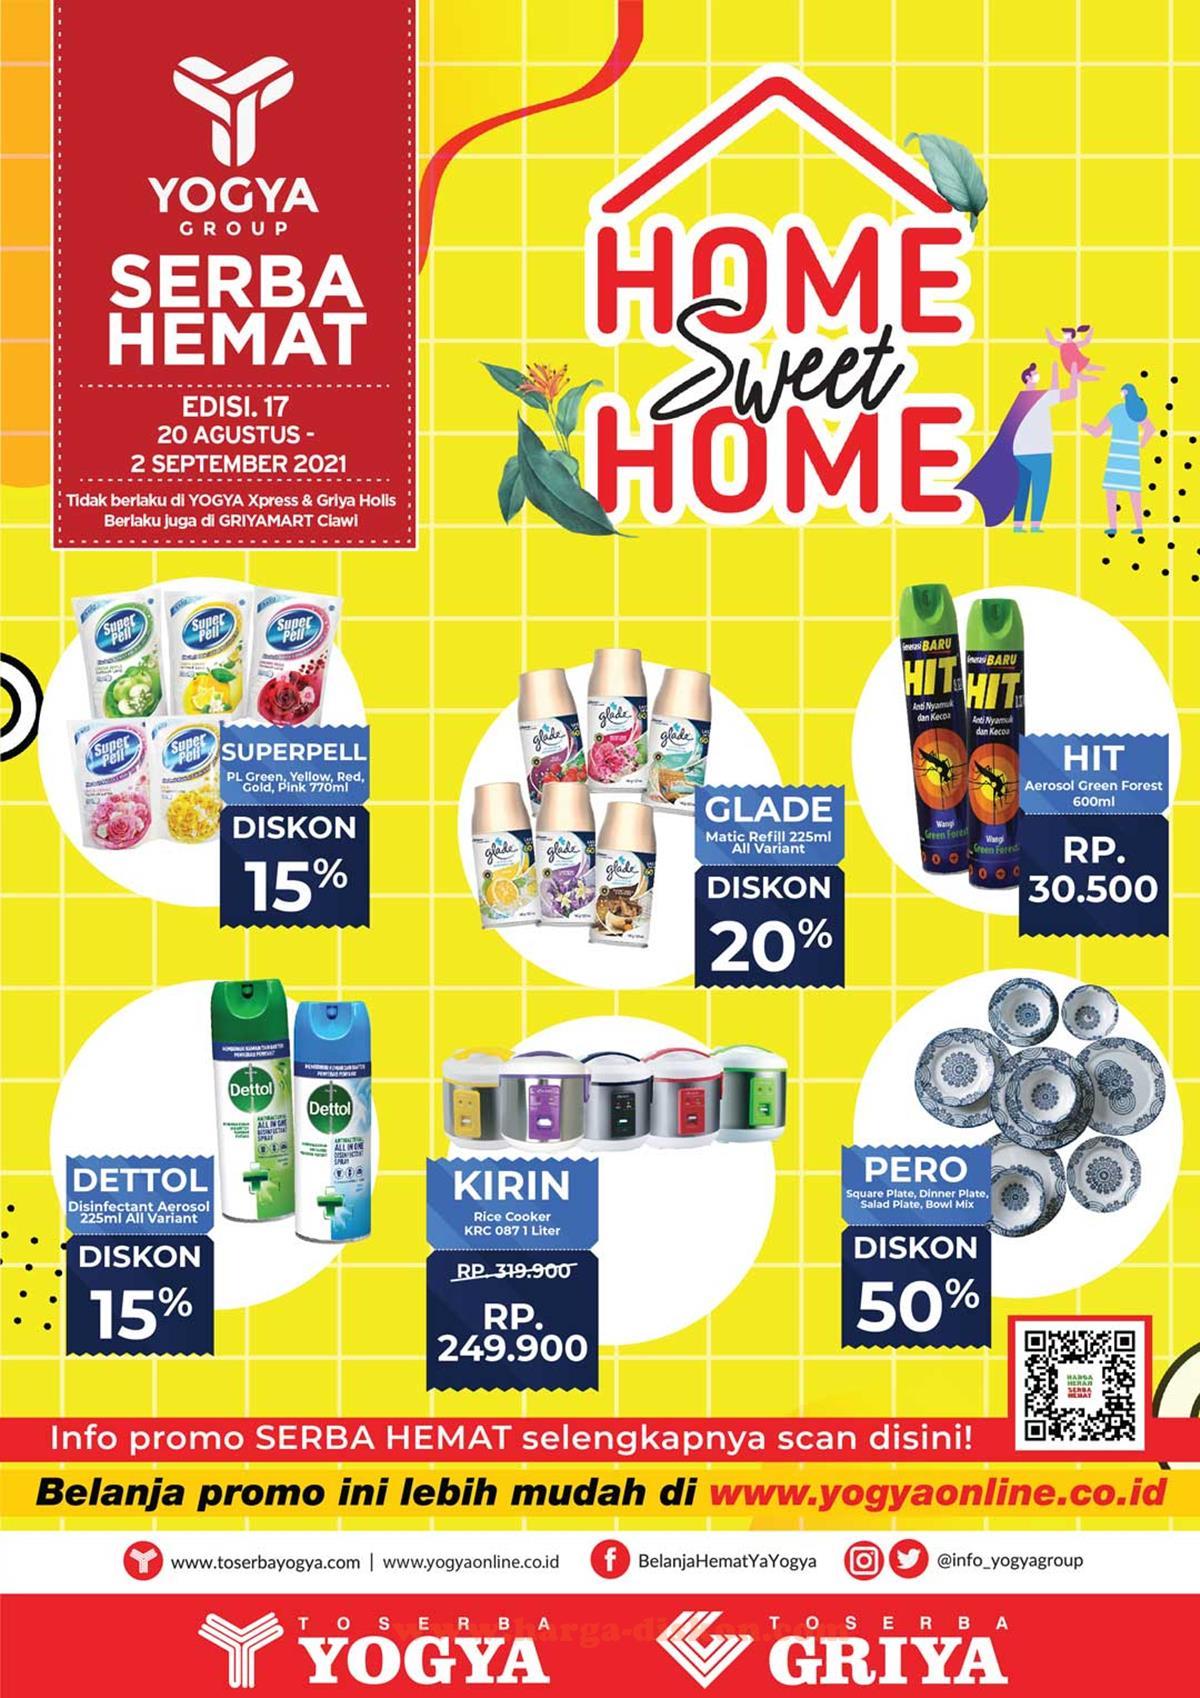 Katalog Promo Toserba Yogya Terbaru 20 Agustus - 2 September 2021